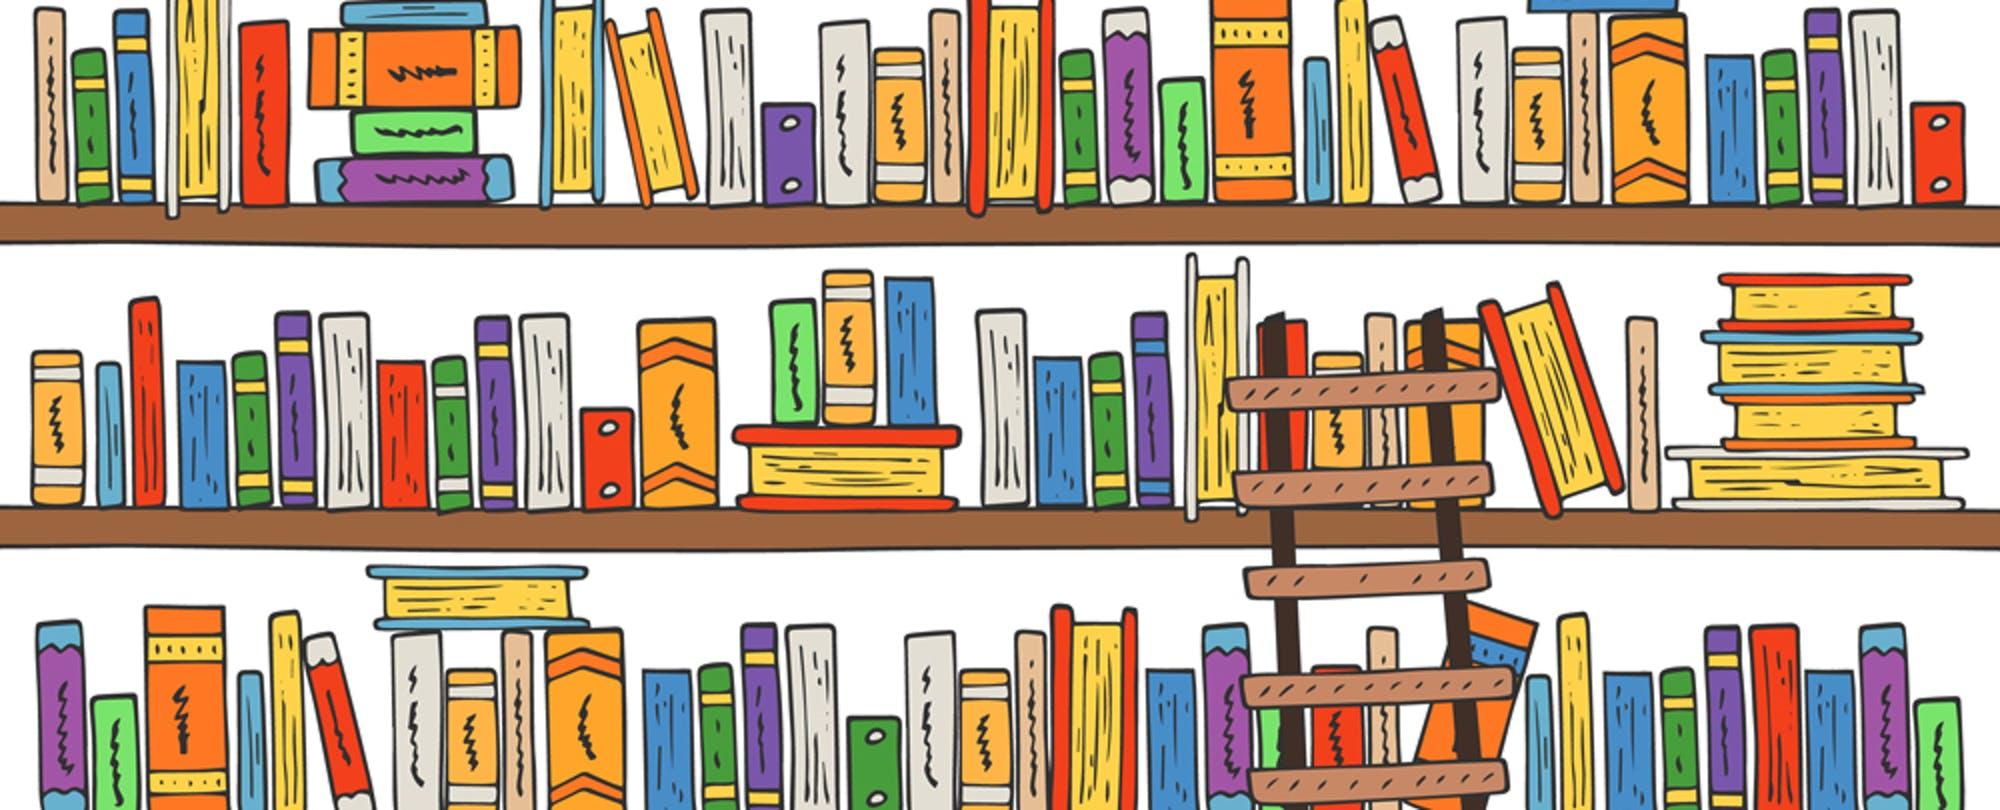 Curriculet's Big Changes Empower Students But Stir Teacher Concerns